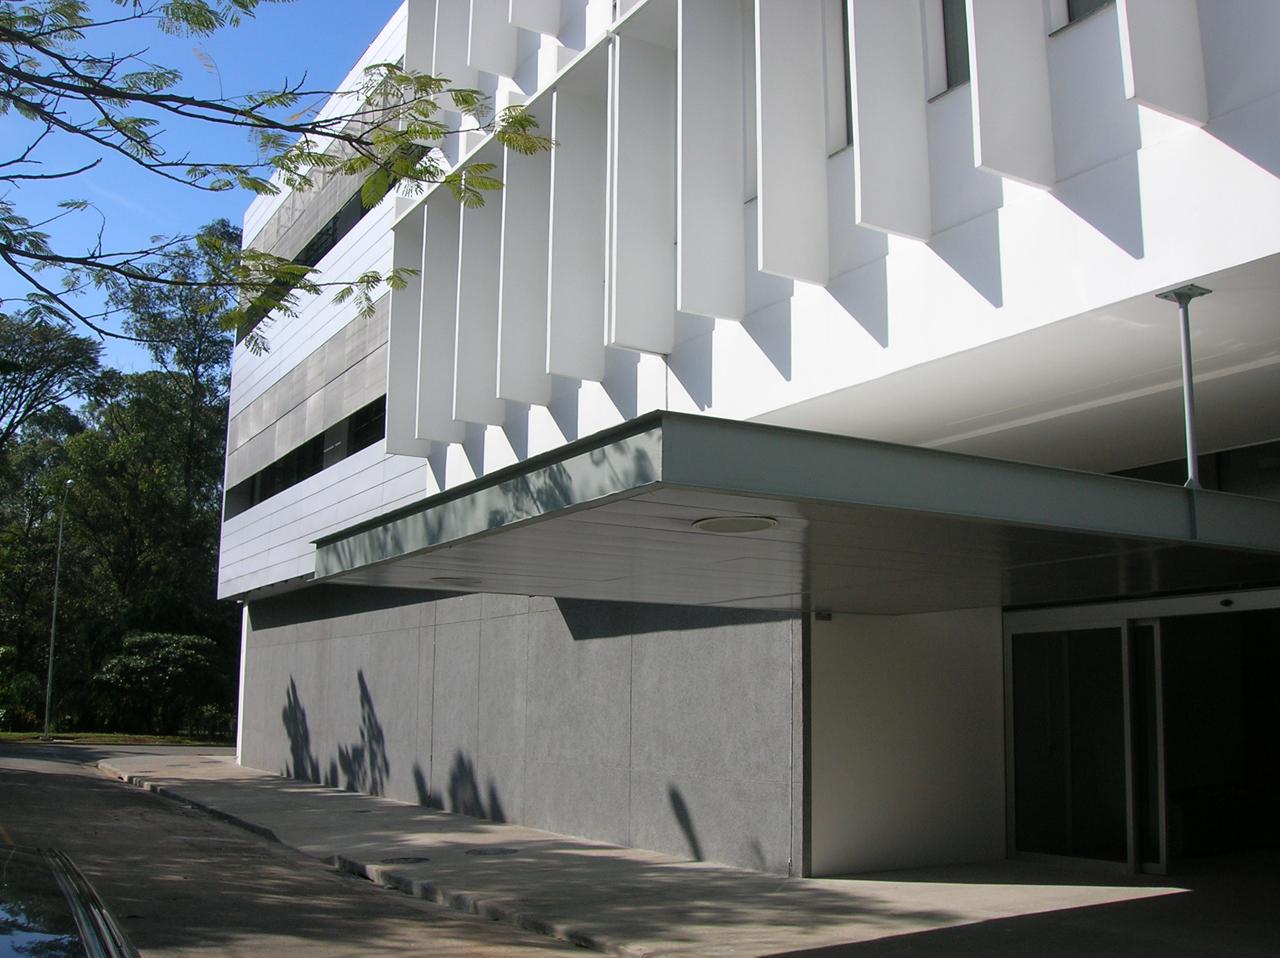 Prédio 31 / Marcos Acayaba Arquitetos + Metrópole Arquitetos, © Maira Acayaba